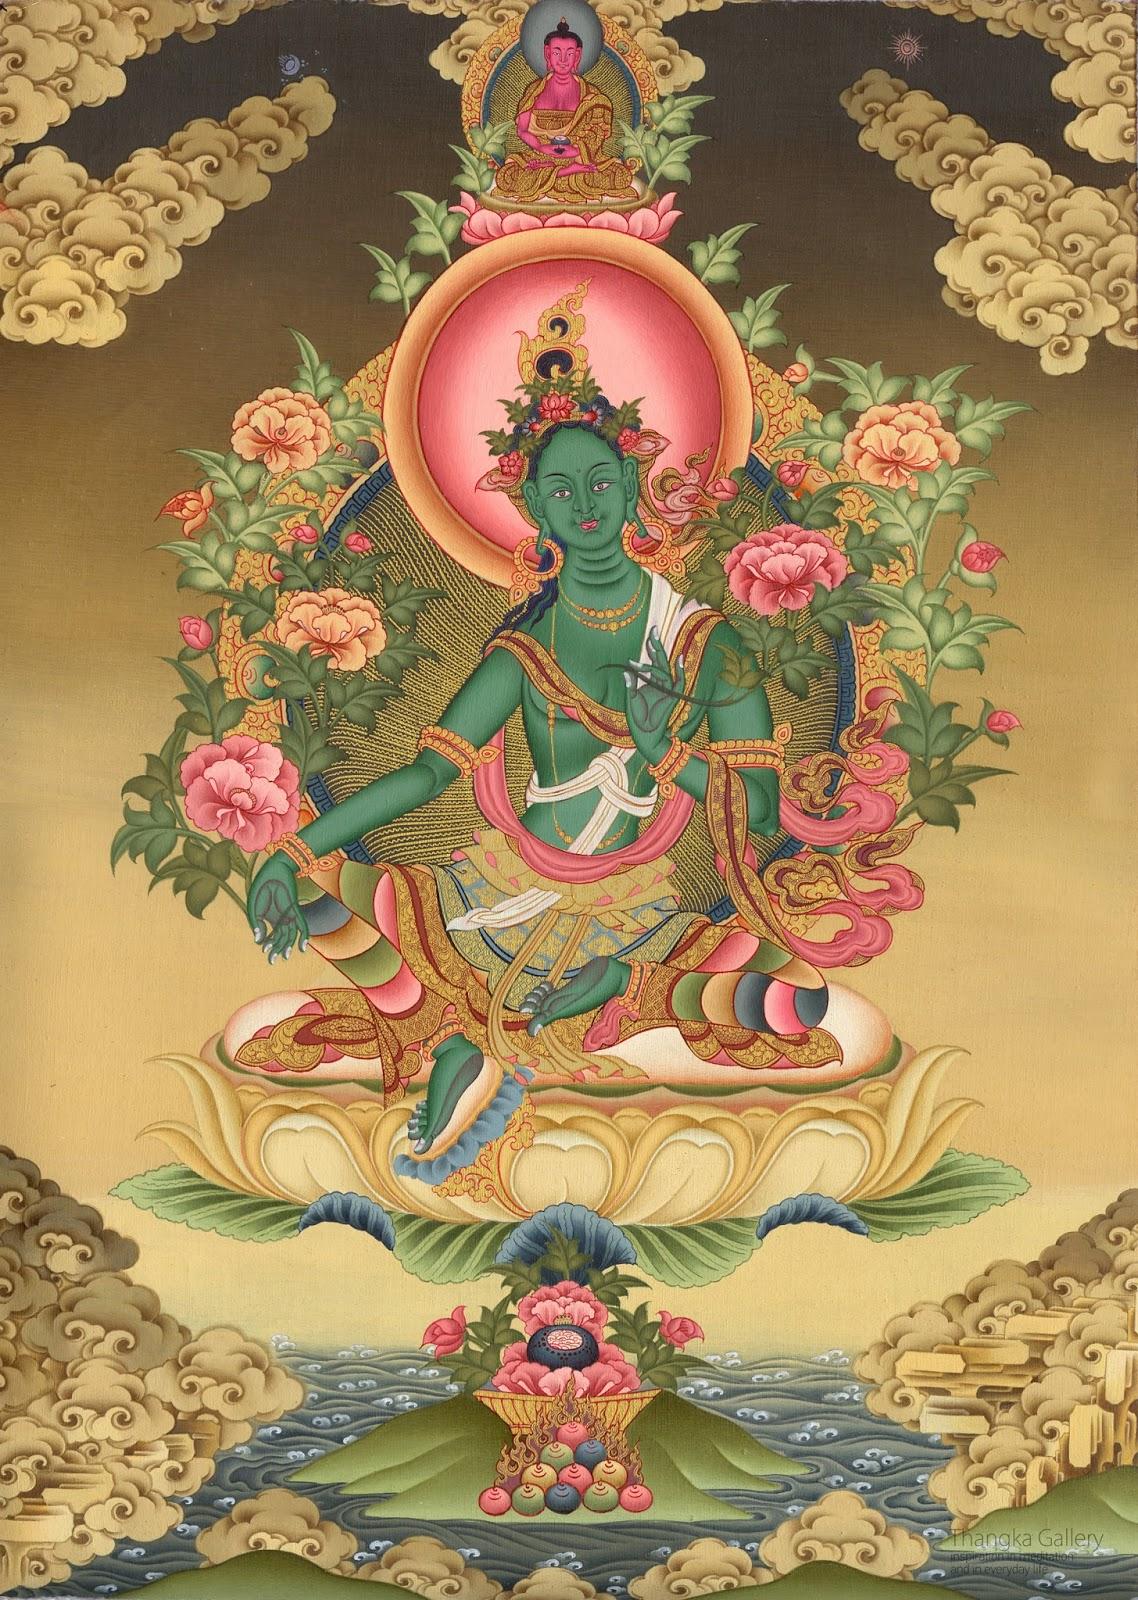 Green Tara 3: The Healing Sphere